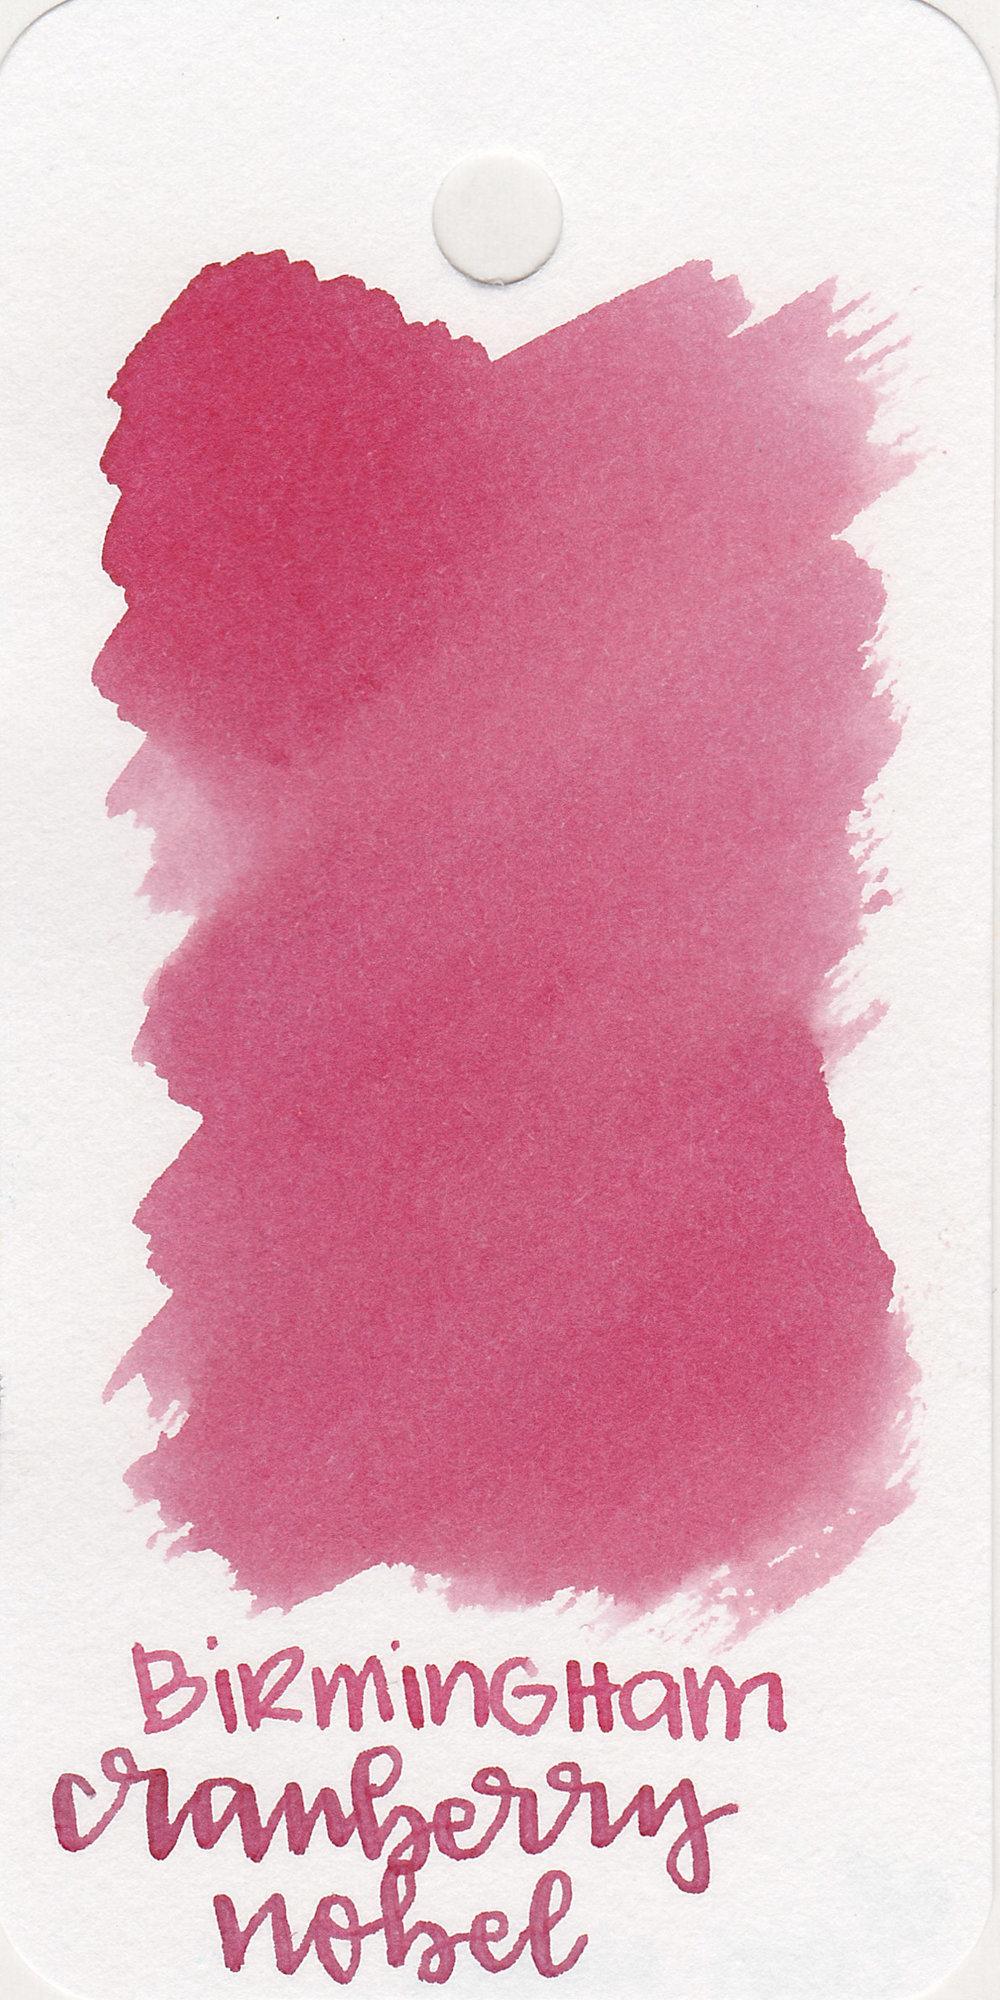 bp-cranberry-nobel-1.jpg